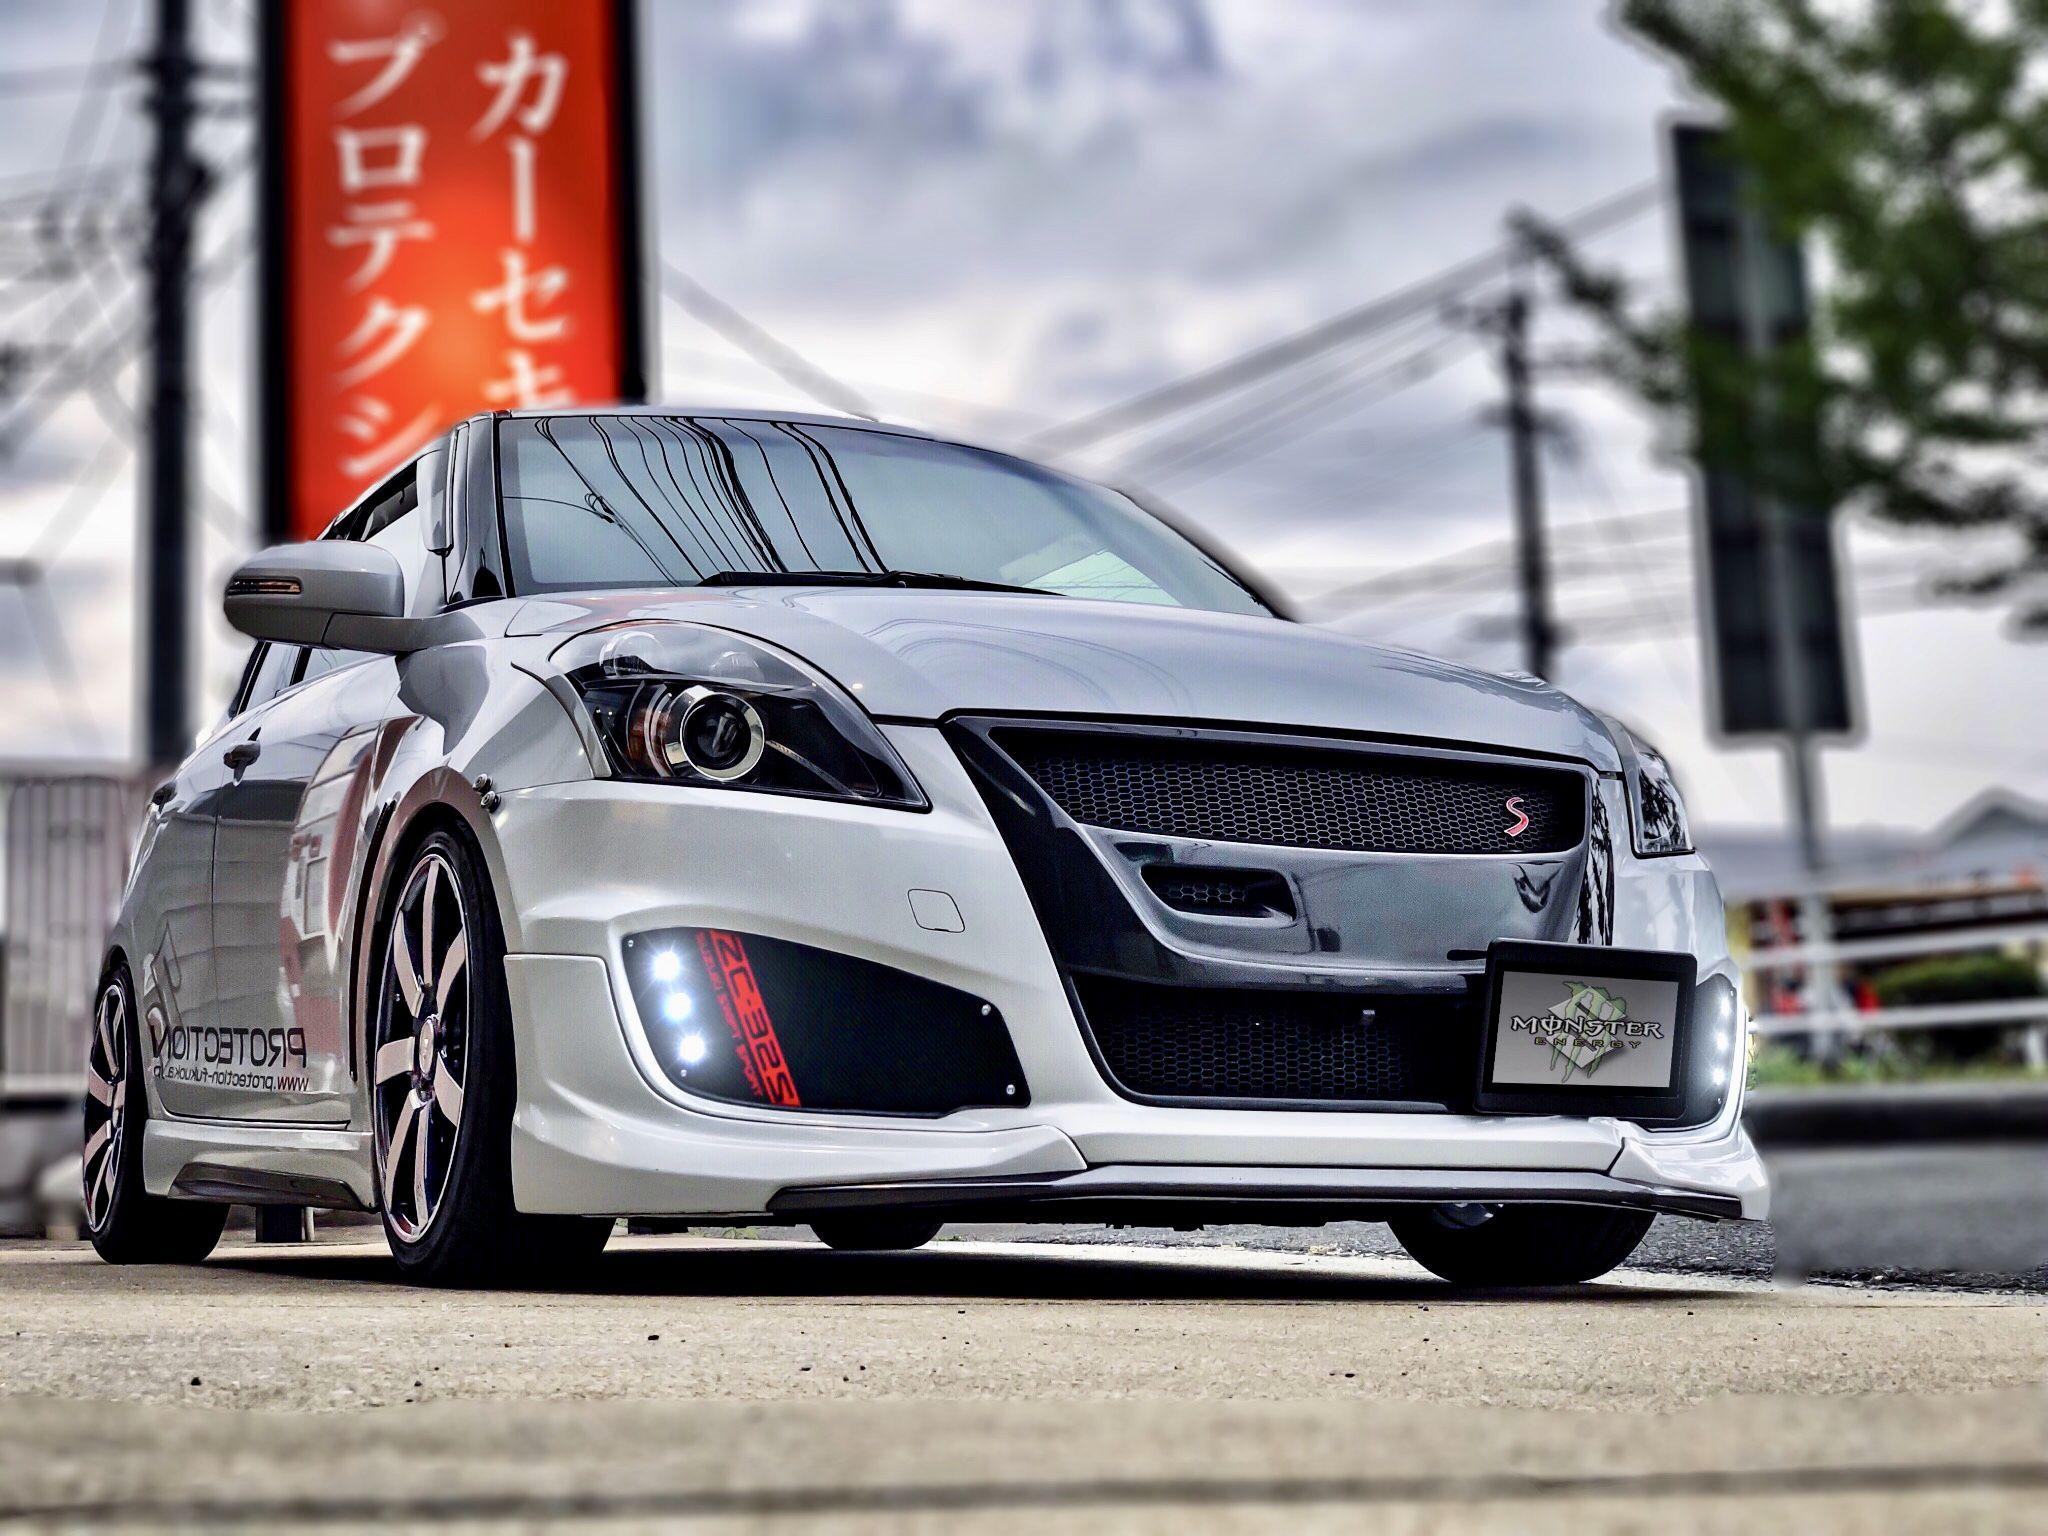 Photo of suzuki swift modified